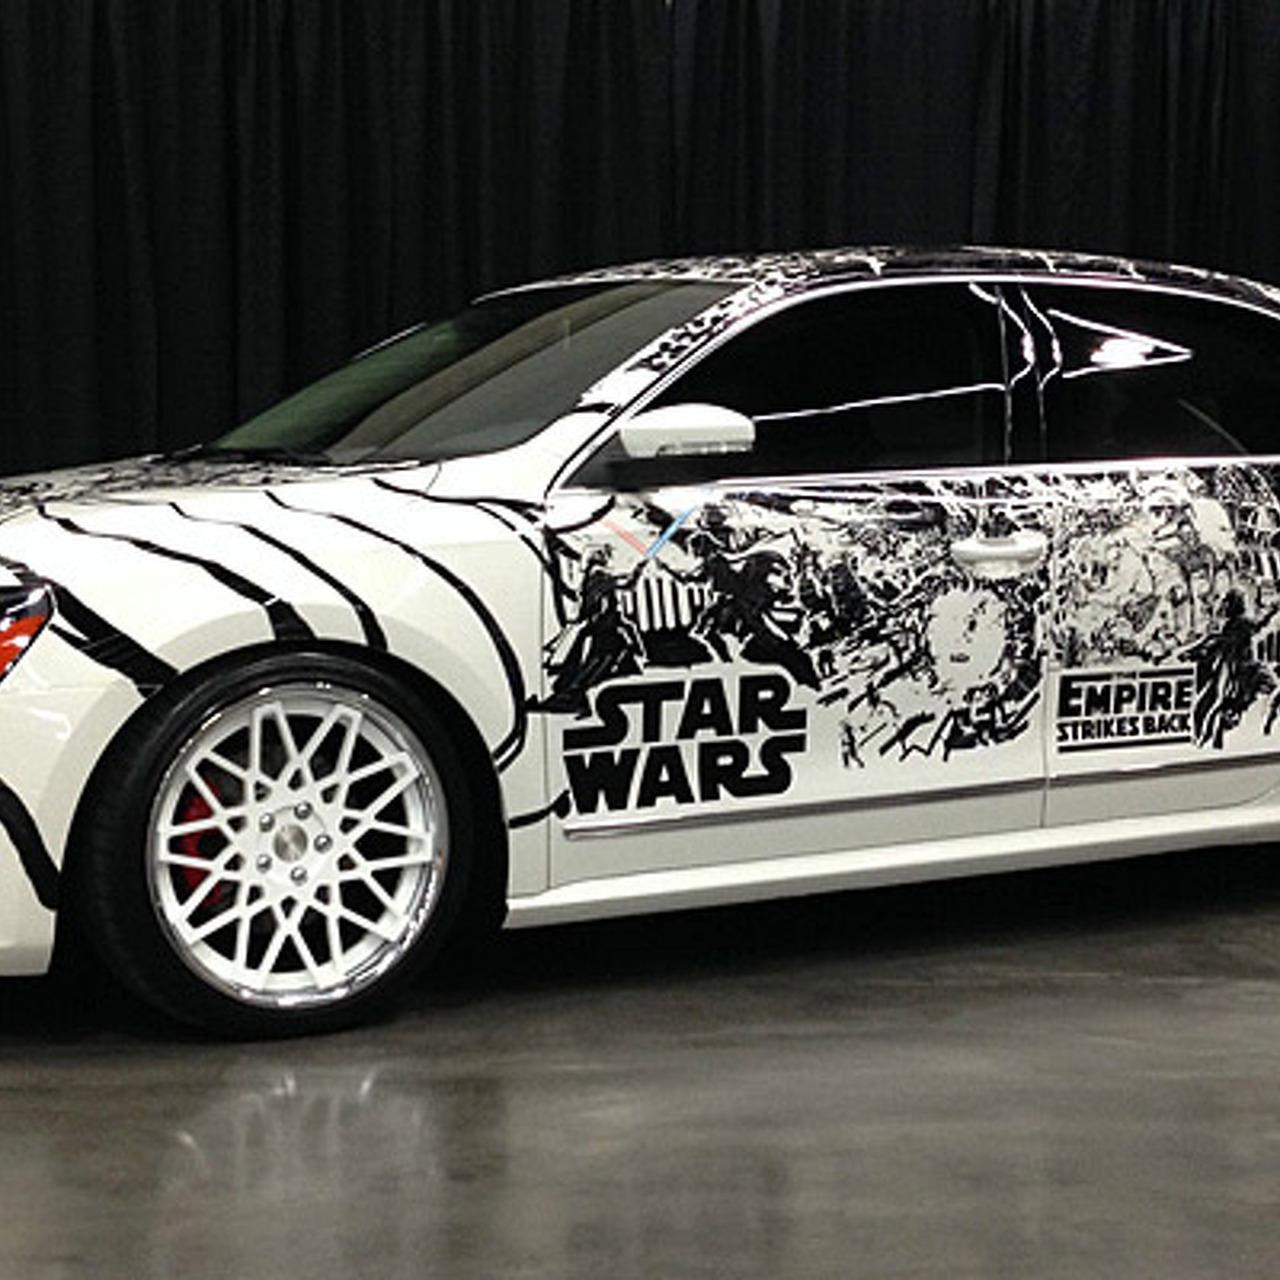 Star Wars Fans, Your Volkswagen Has Arrived